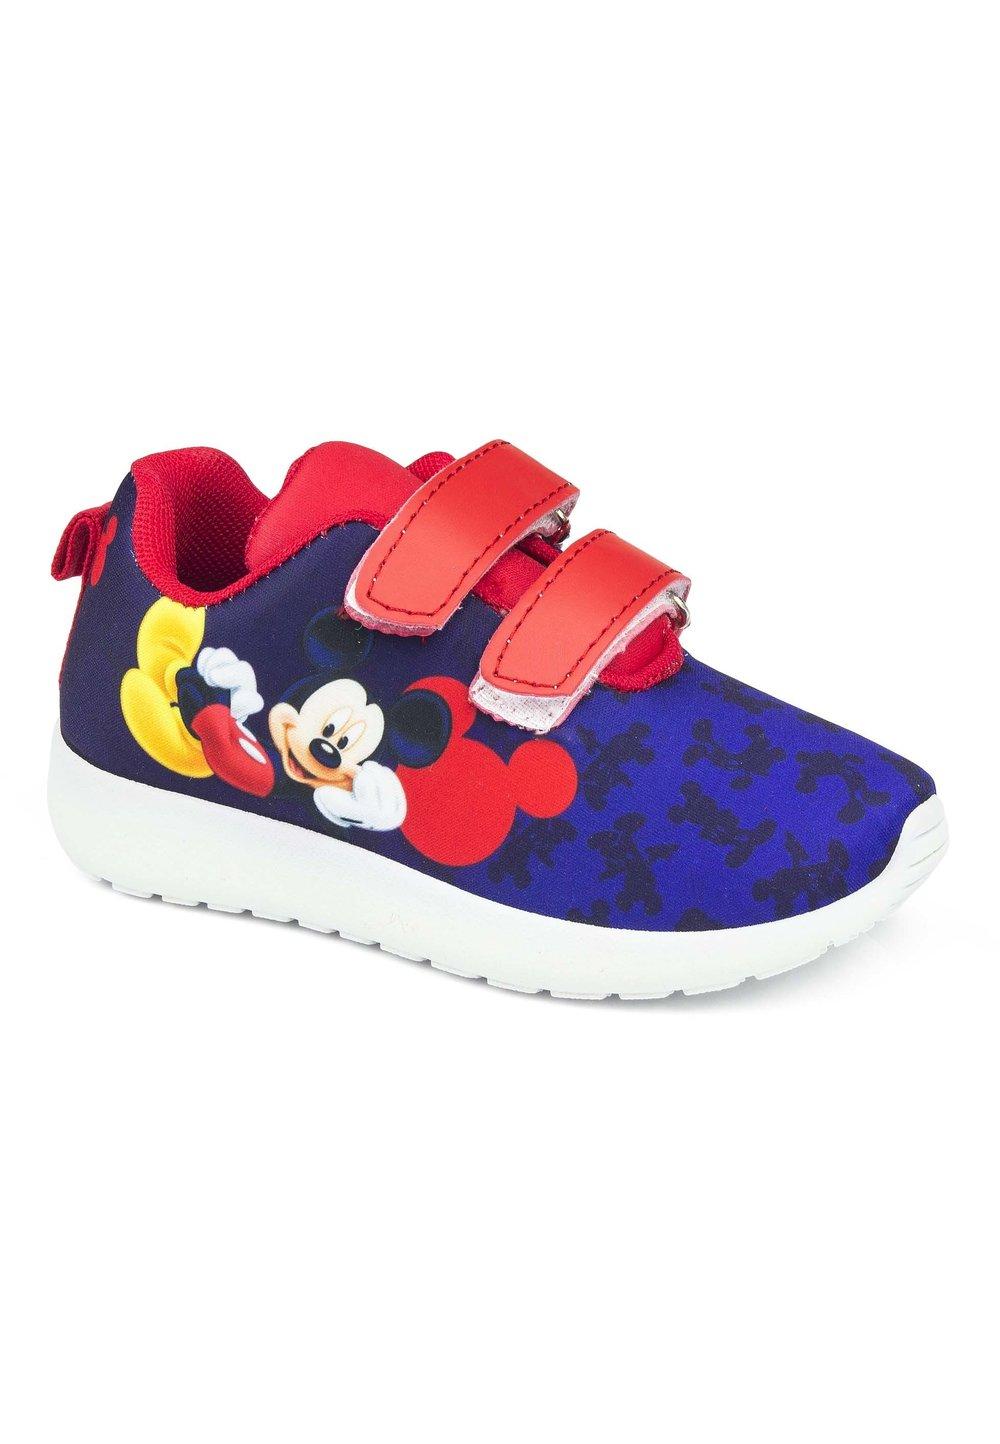 Incaltaminte sport cu scai, Mickey, bluemarin cu rosu imagine